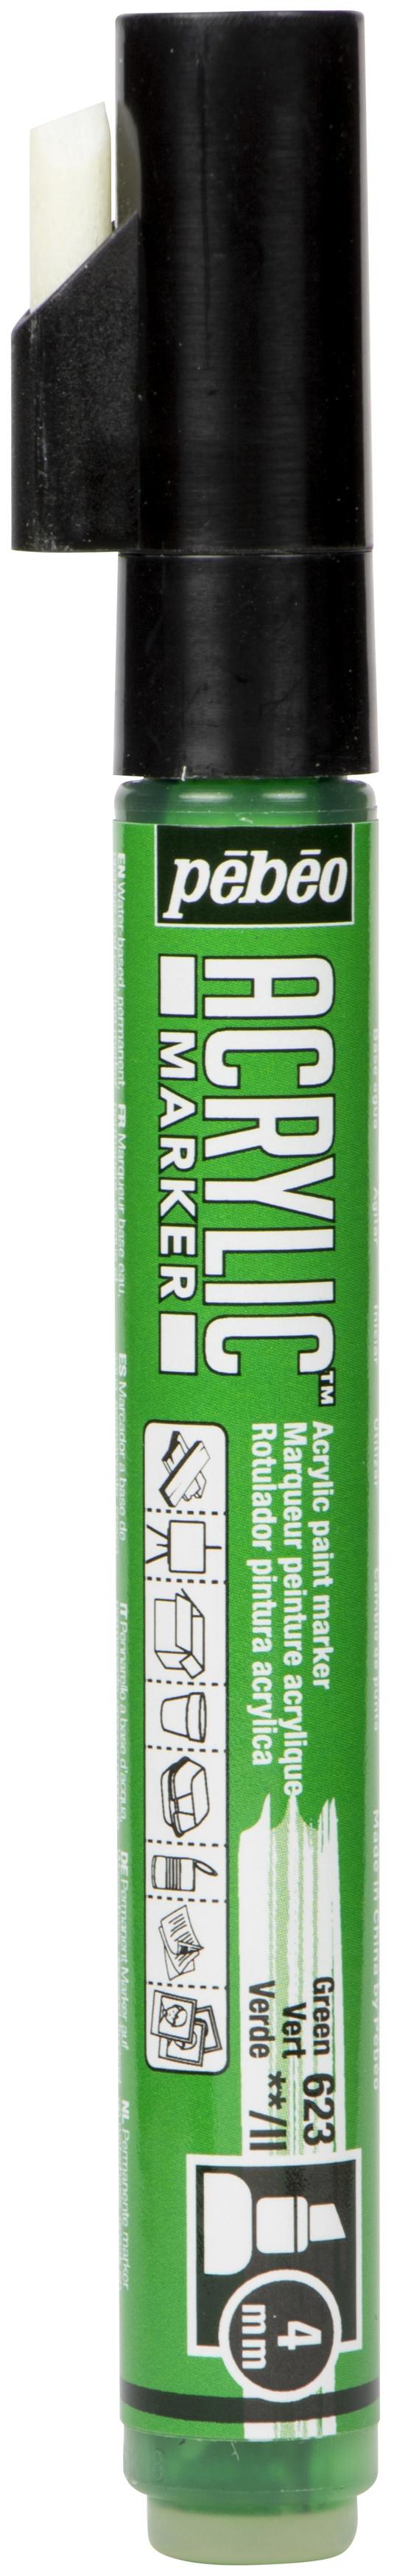 Green Pebeo DecoMarker